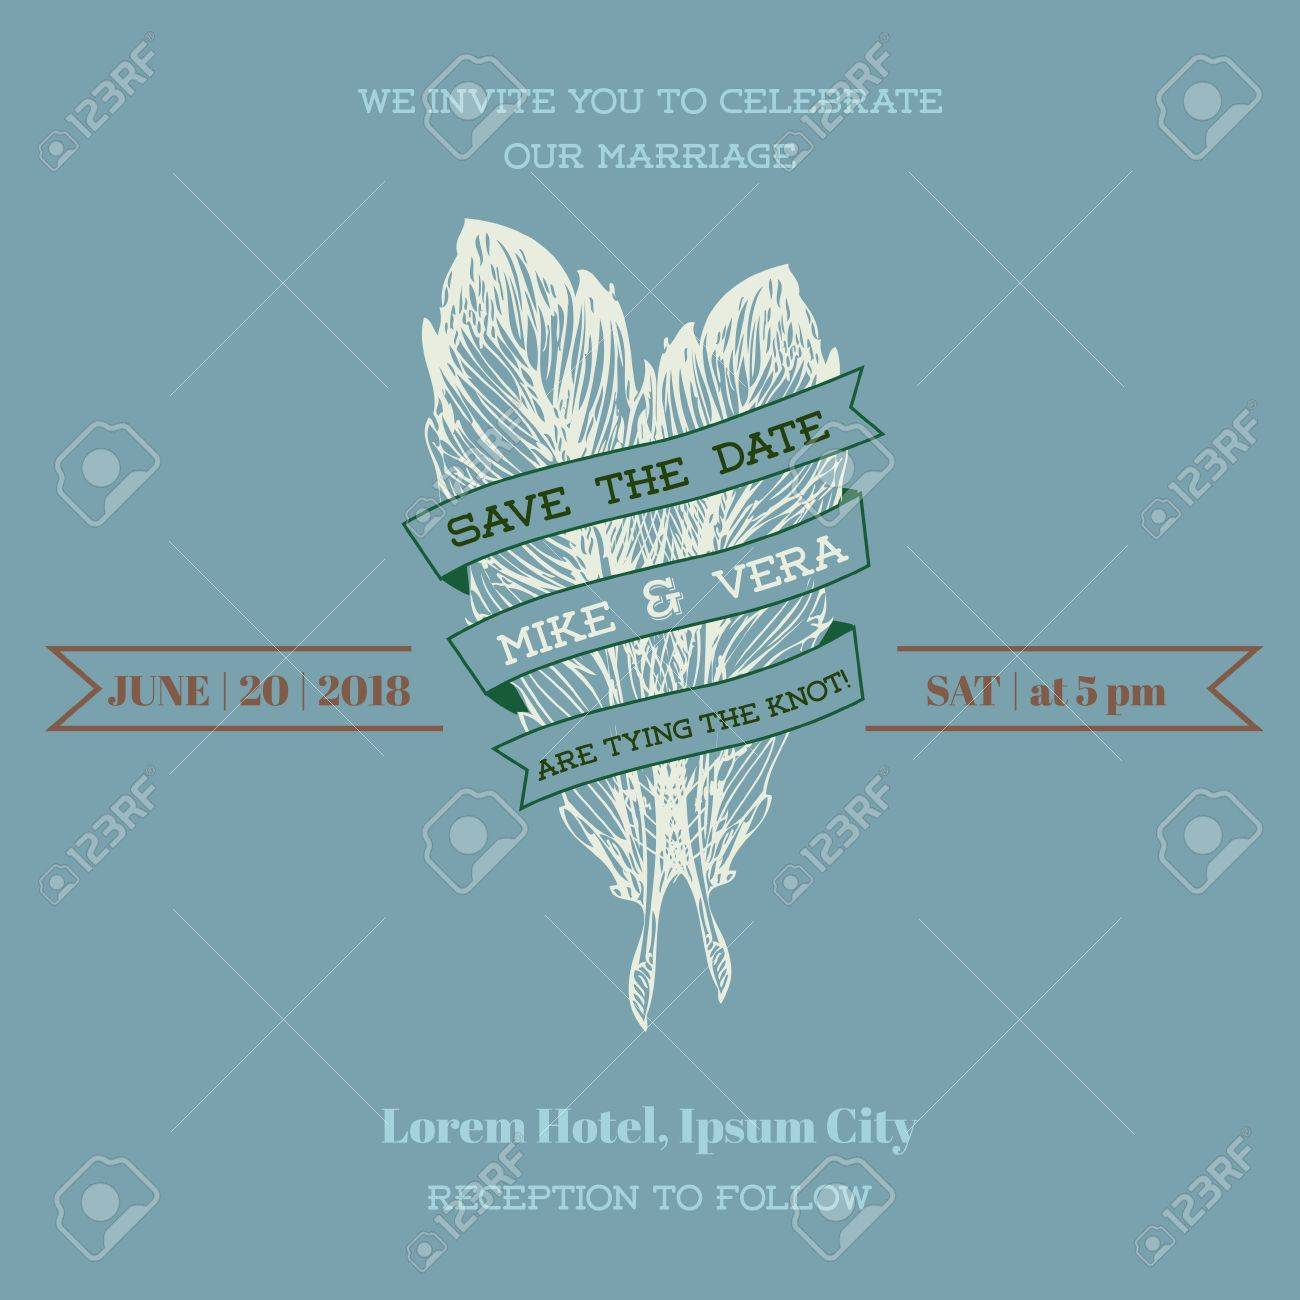 Wedding Vintage Invitation Card - Feather Theme Stock Vector - 17621341